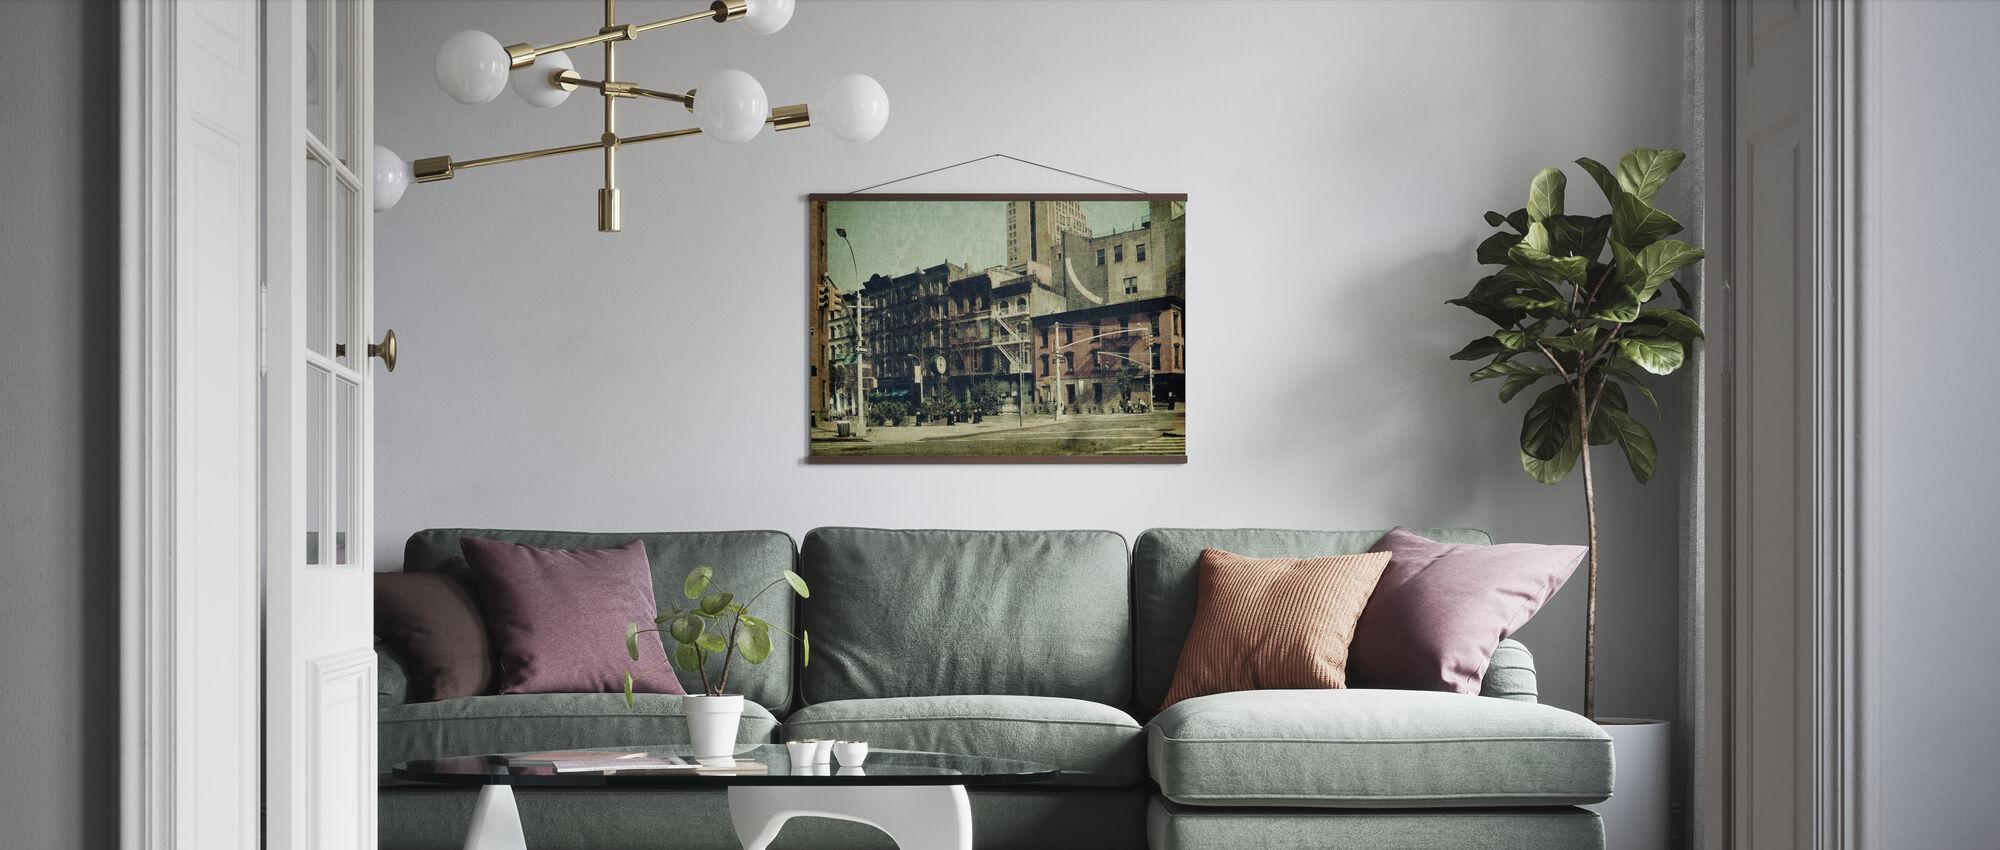 New York City - Sixth Avenue - Poster - Living Room